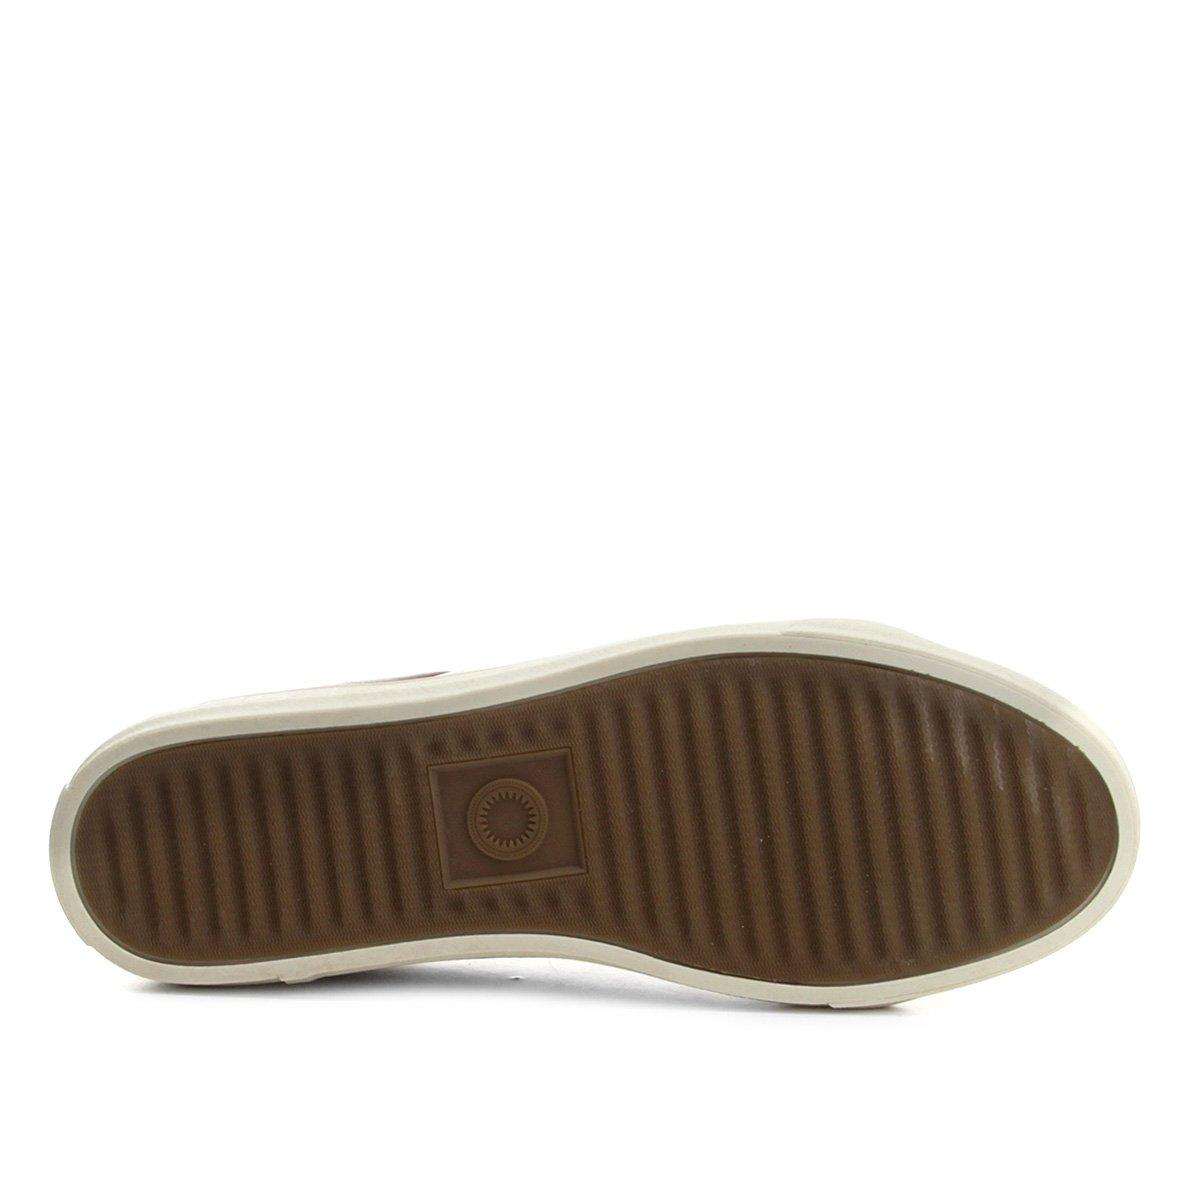 Masculino Lateral Sapatênis Recorte Marrom Shoestock Couro Sapatênis Couro xw1TnSwqY